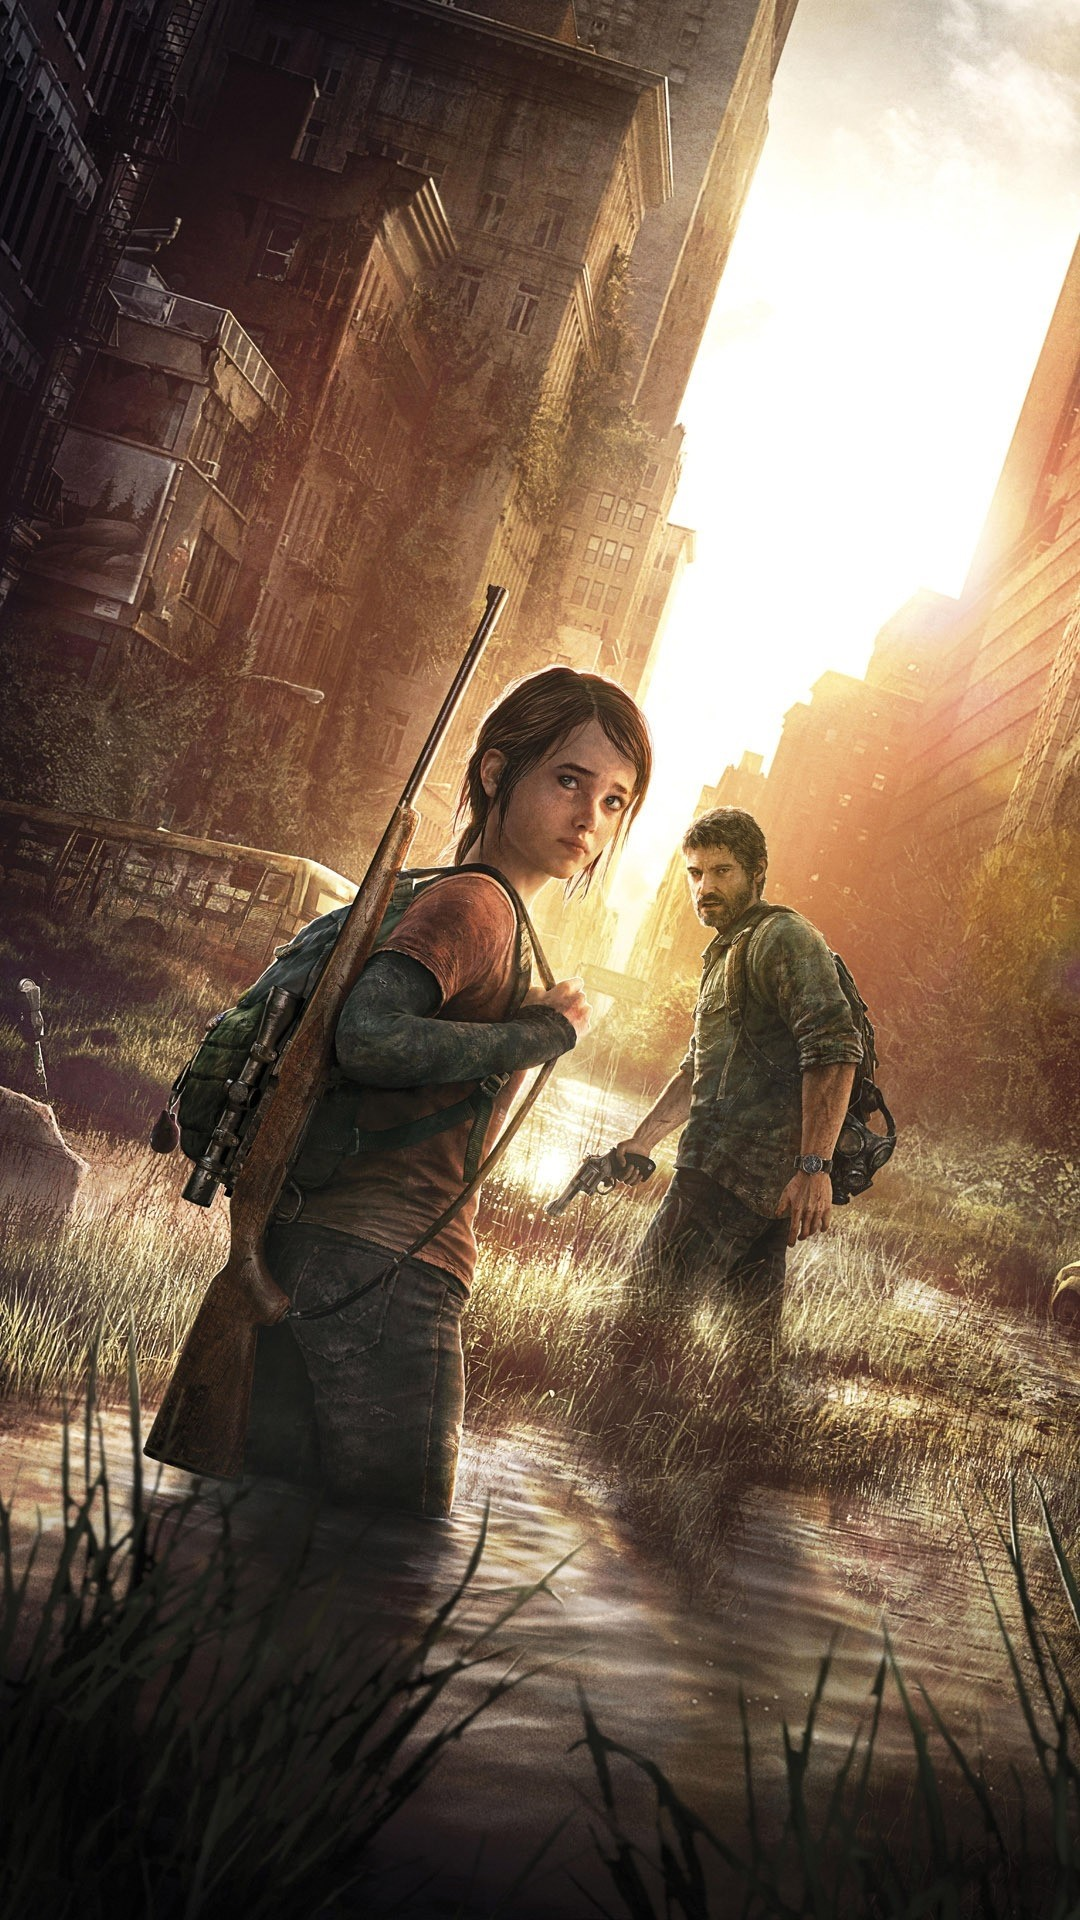 The Last Of Us ios wallpaper